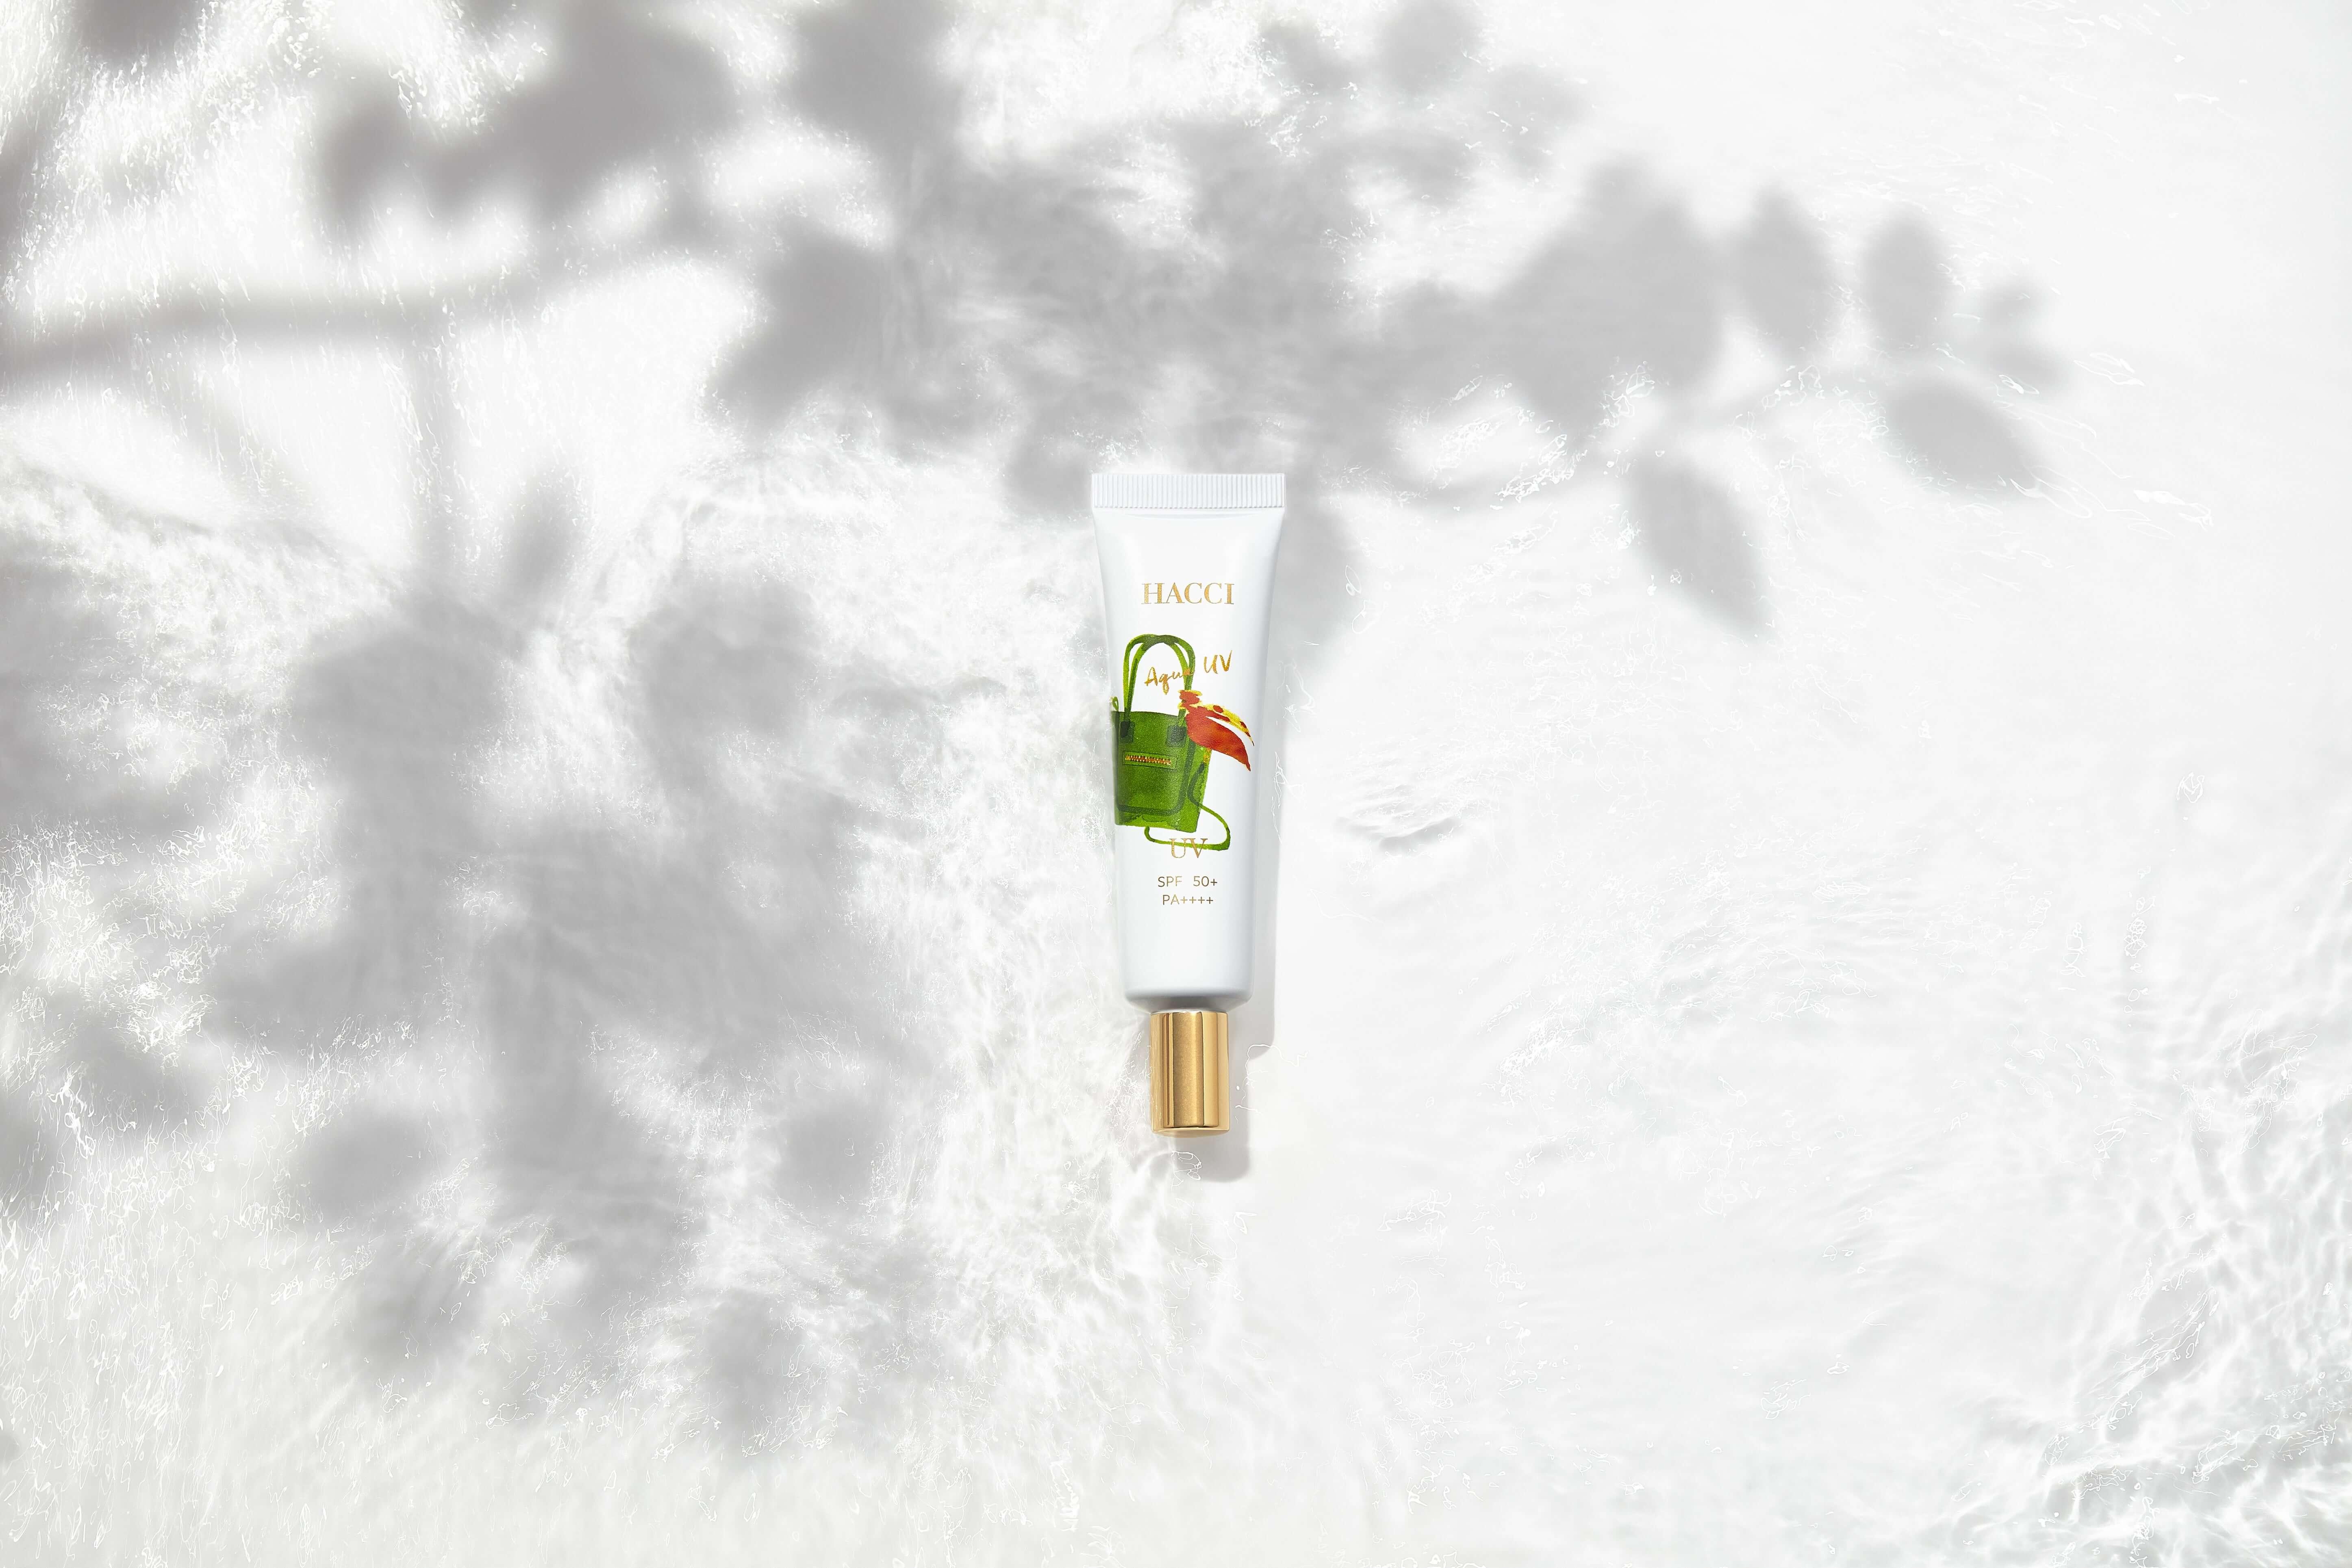 hacci-honey-uv-collection-2021-3-1-2